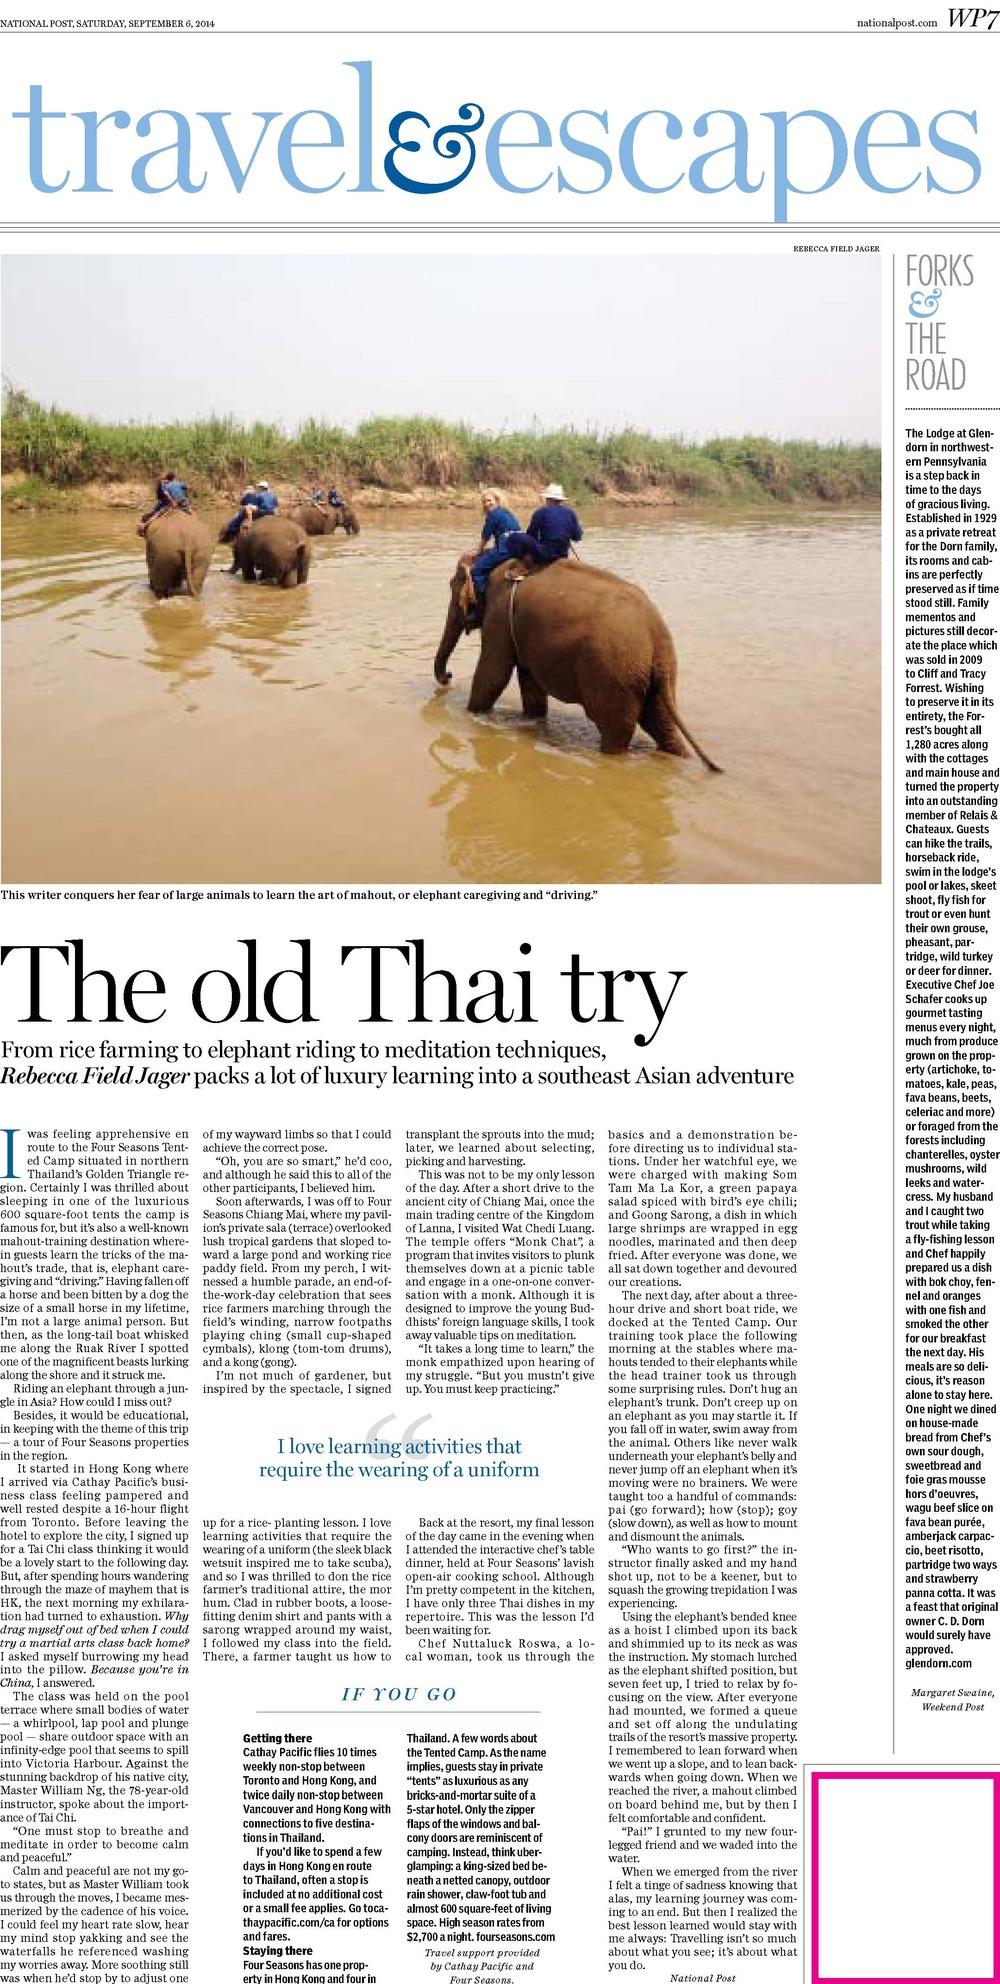 National Post - Sept 2014